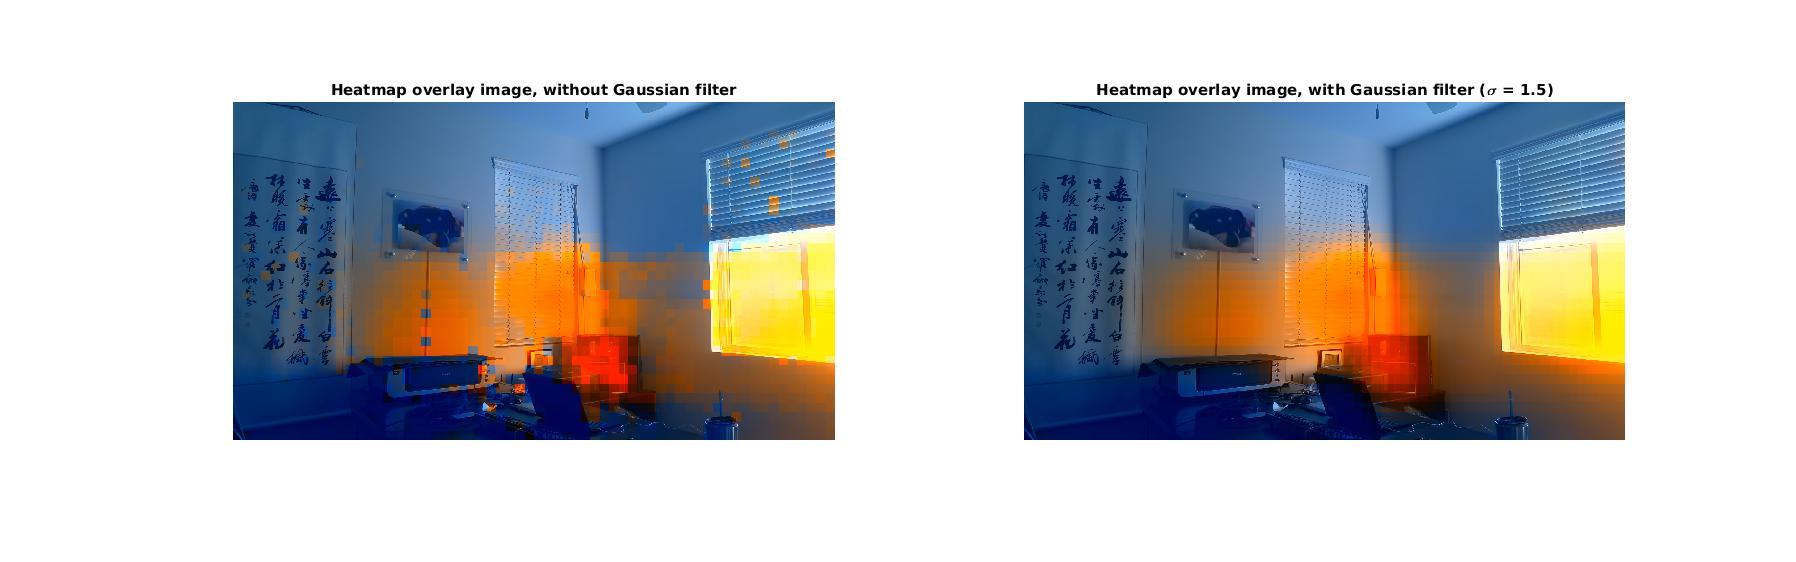 Comparison of heatmap overlay